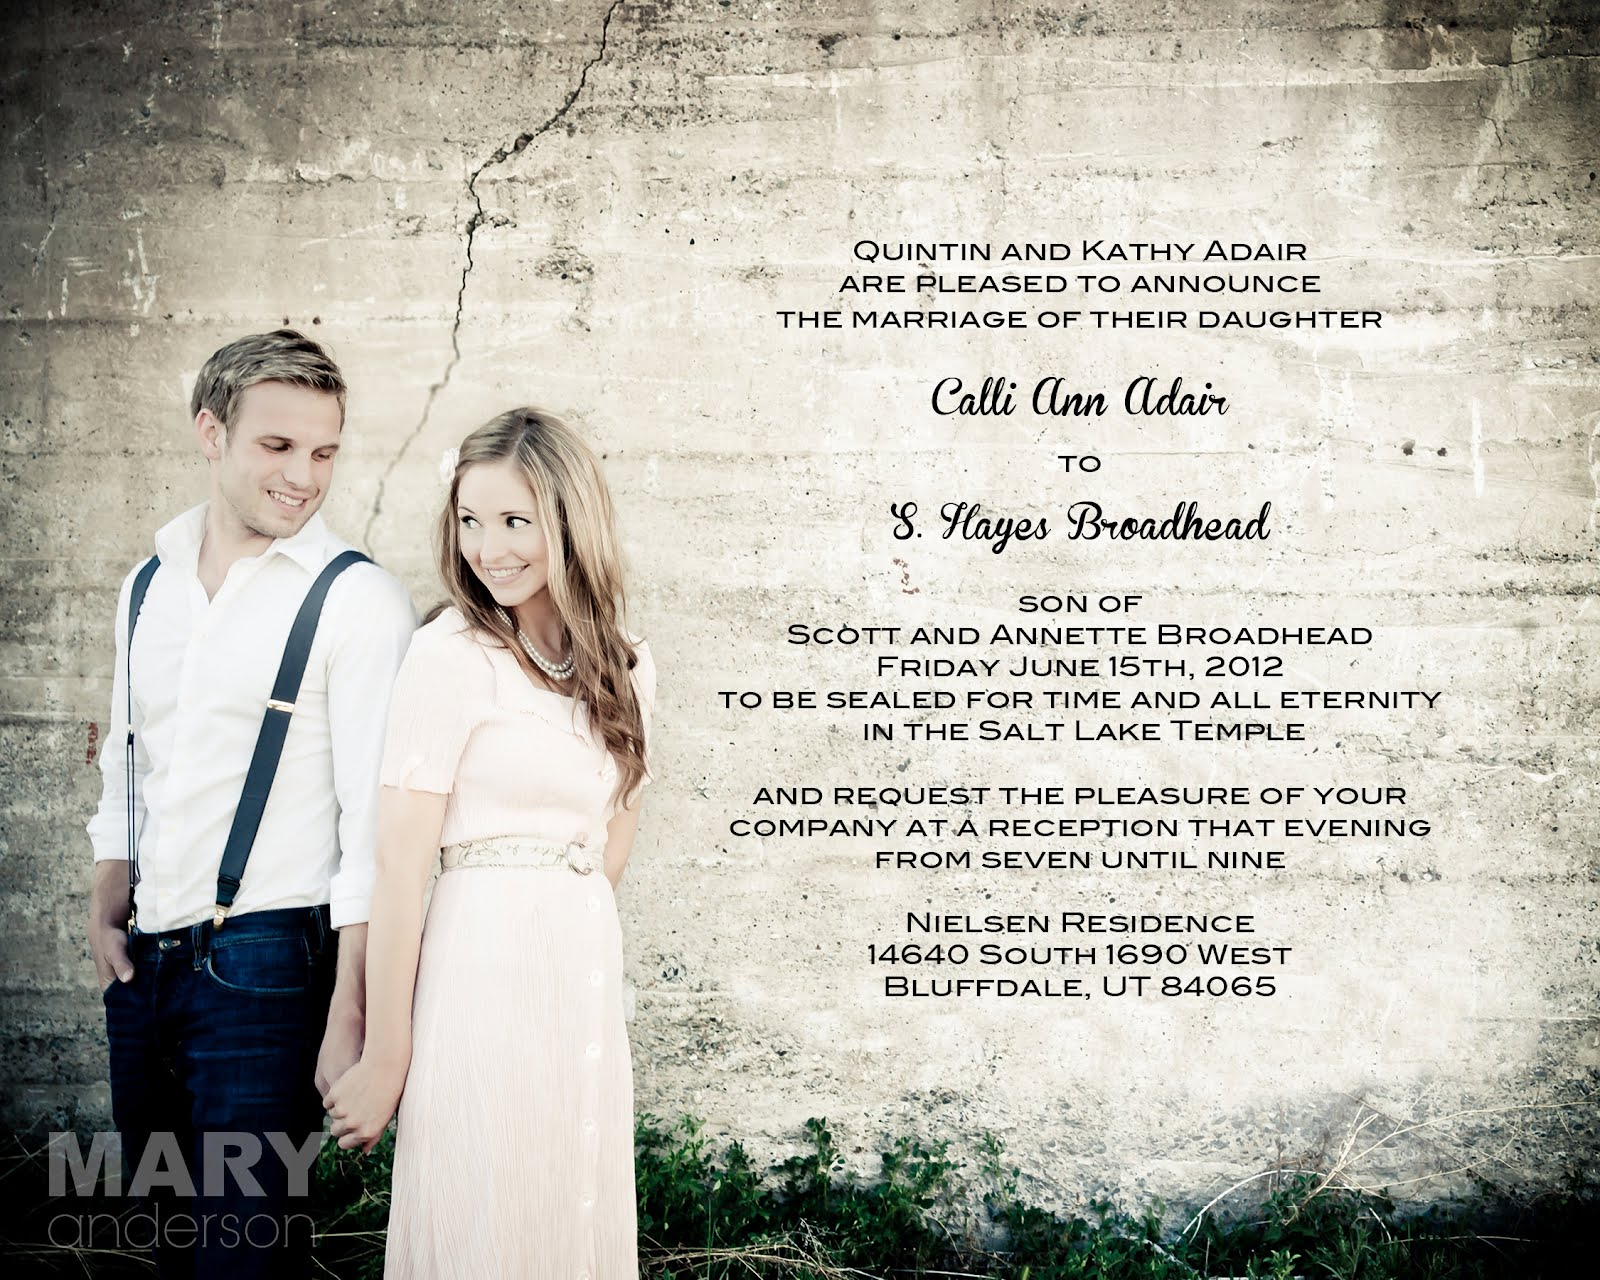 beautiful wedding announcements utah tbrb info - Wedding Invitations Utah